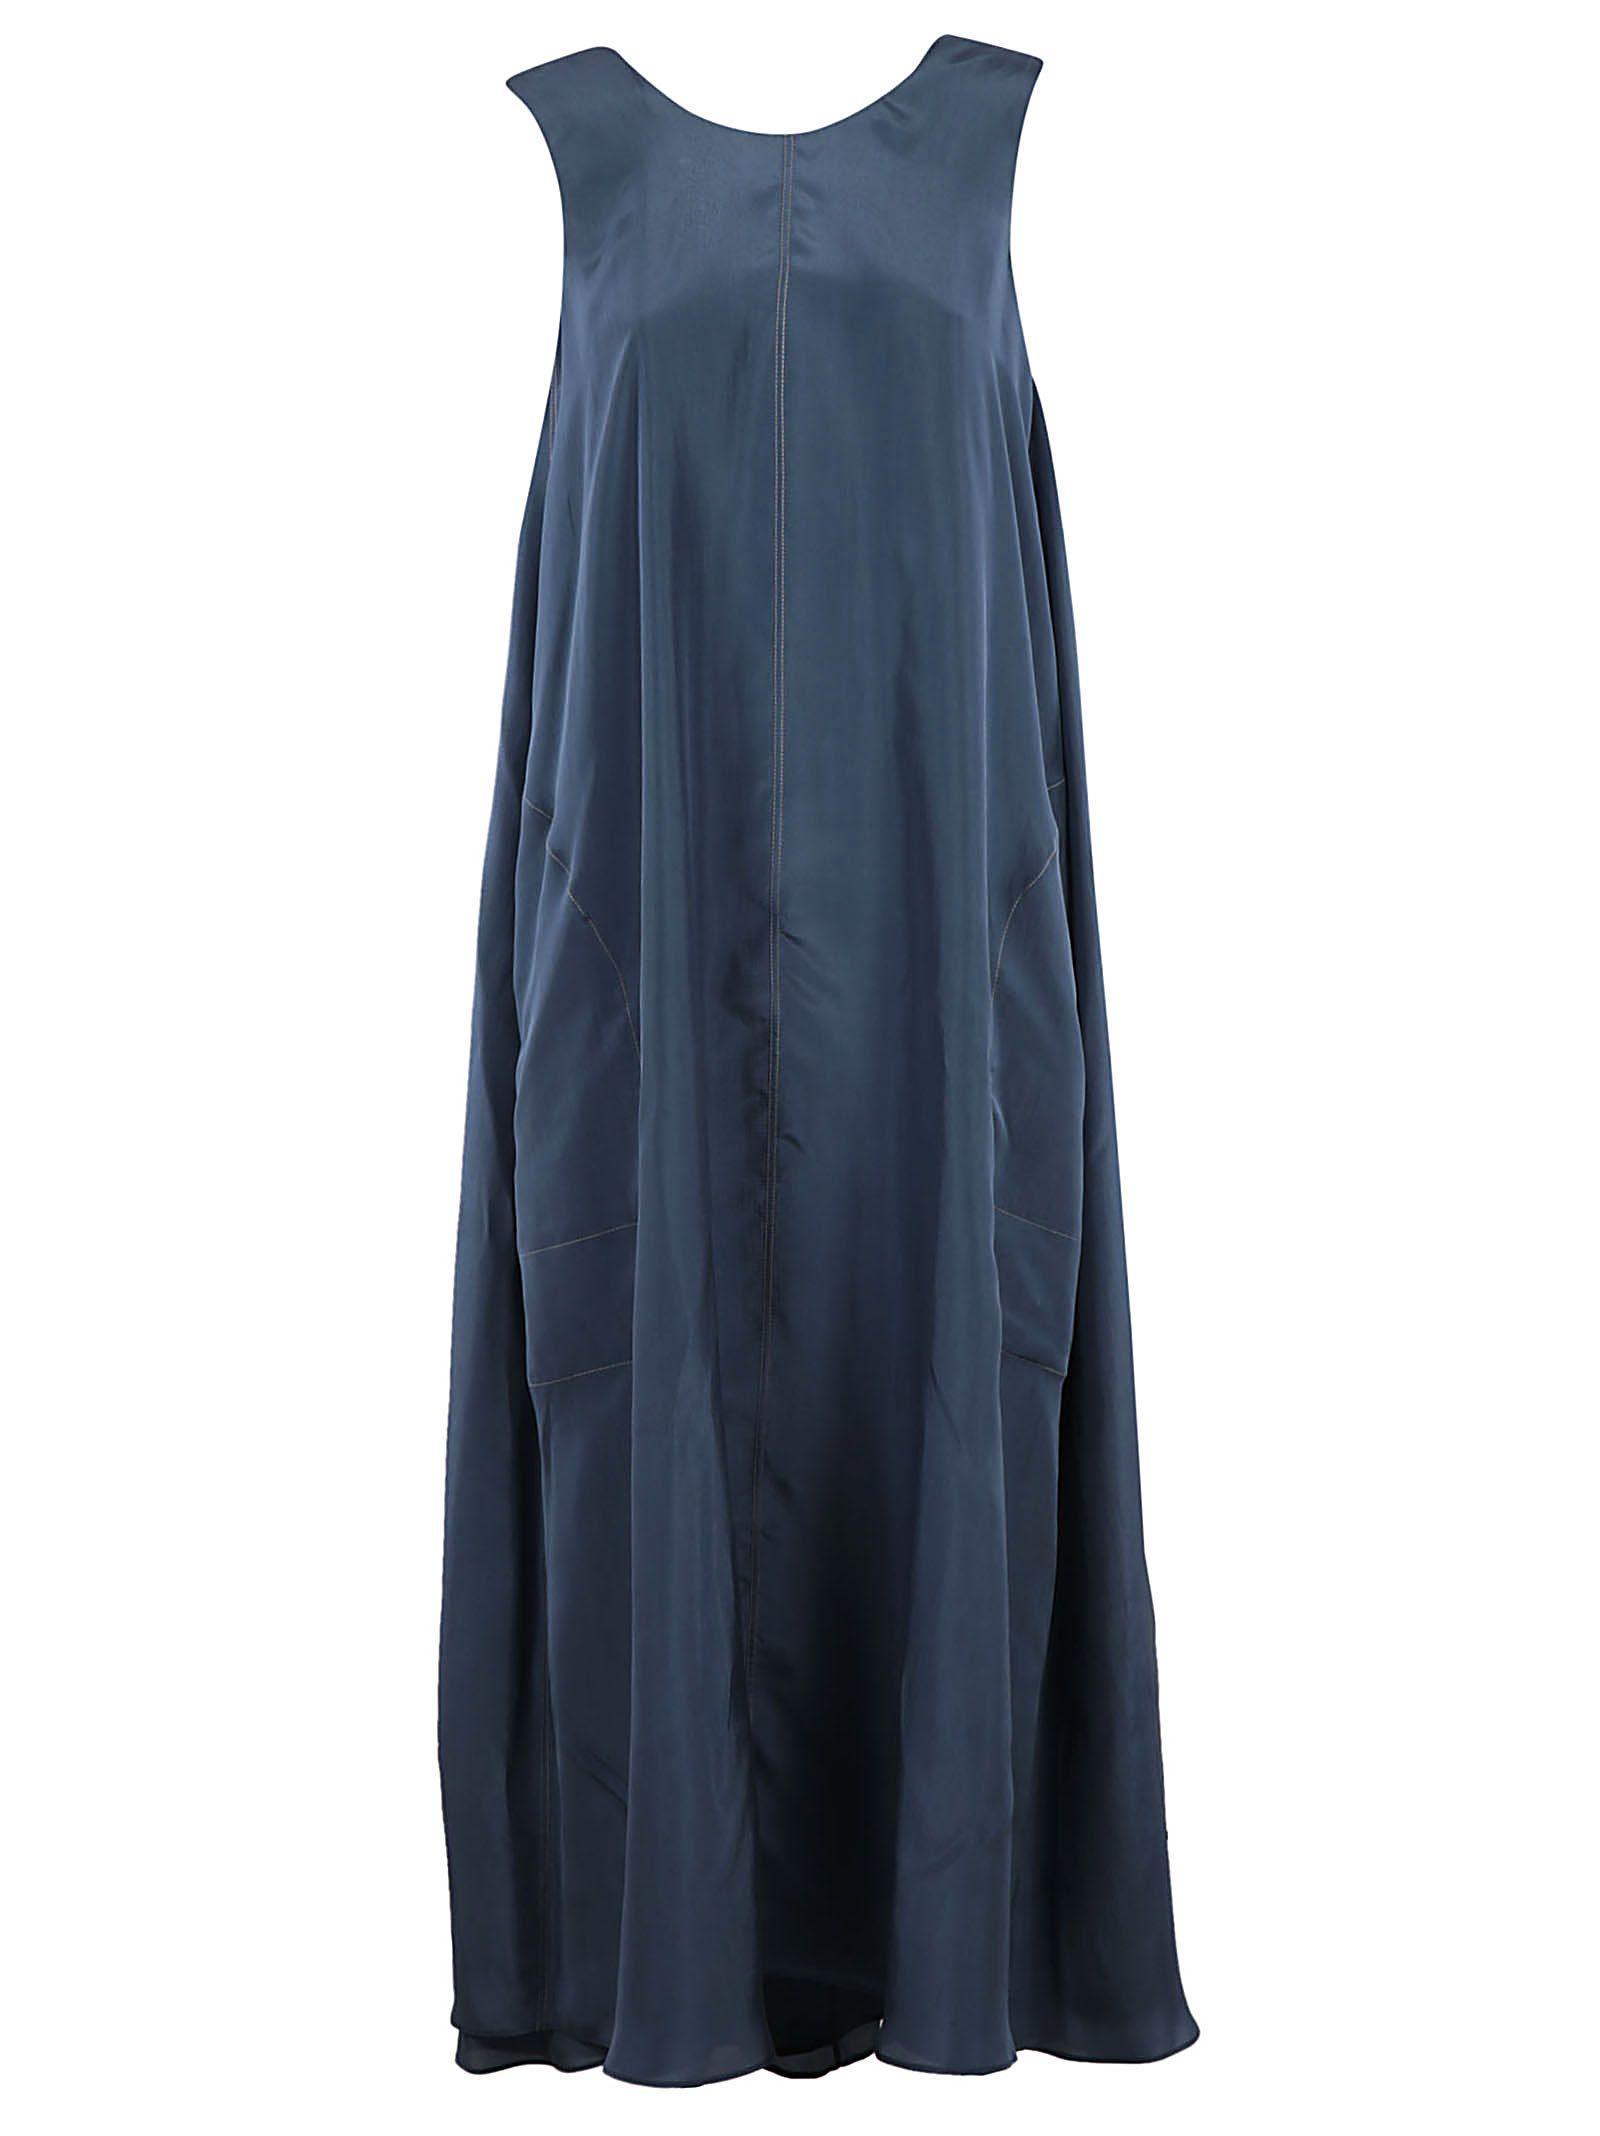 Brunello Cucinelli Flared Dress In Carta Zucchero